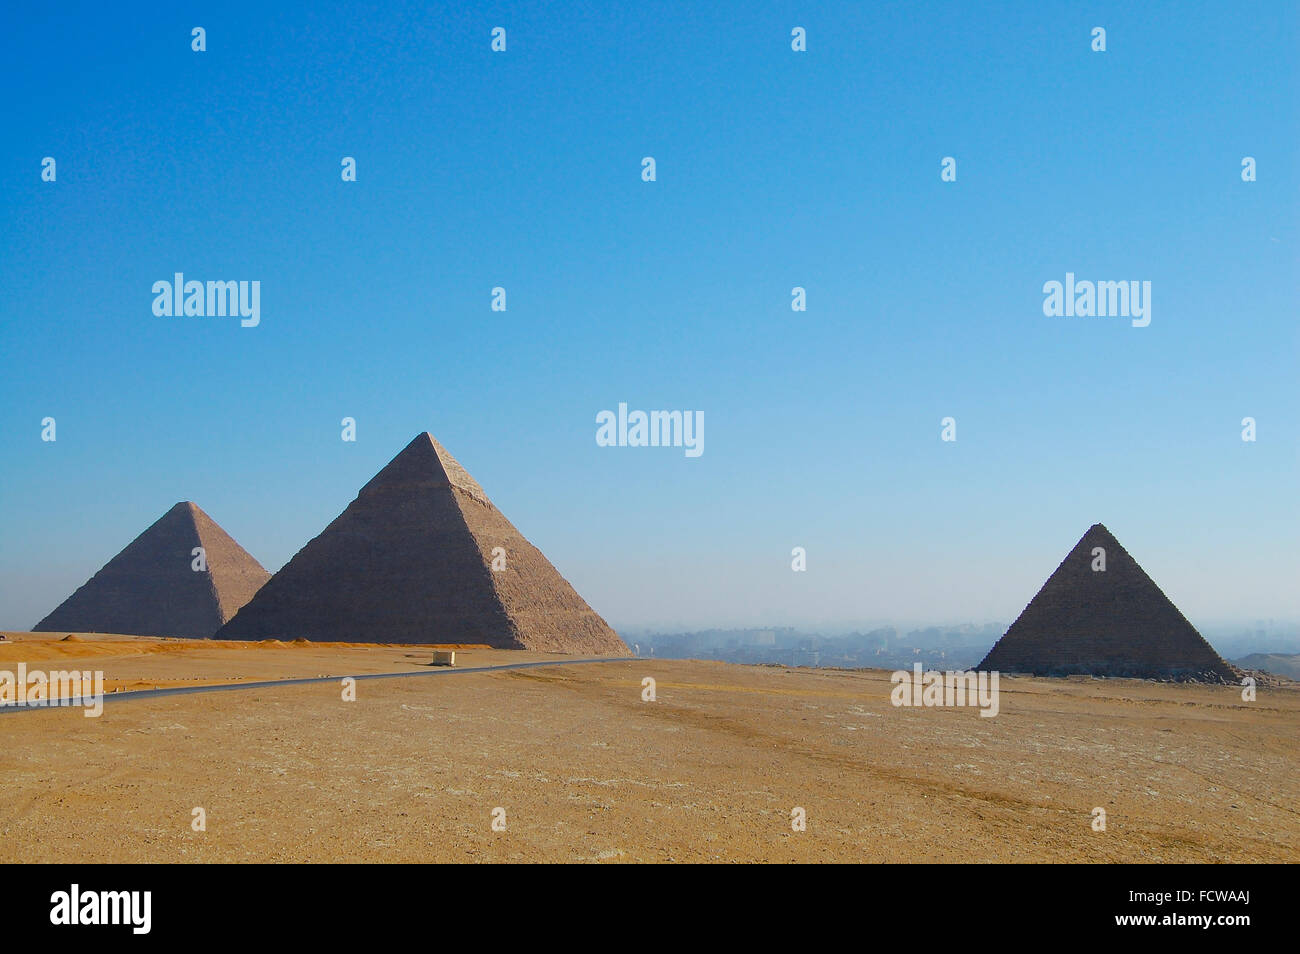 Giza Pyramids - Cairo - Egypt - Stock Image